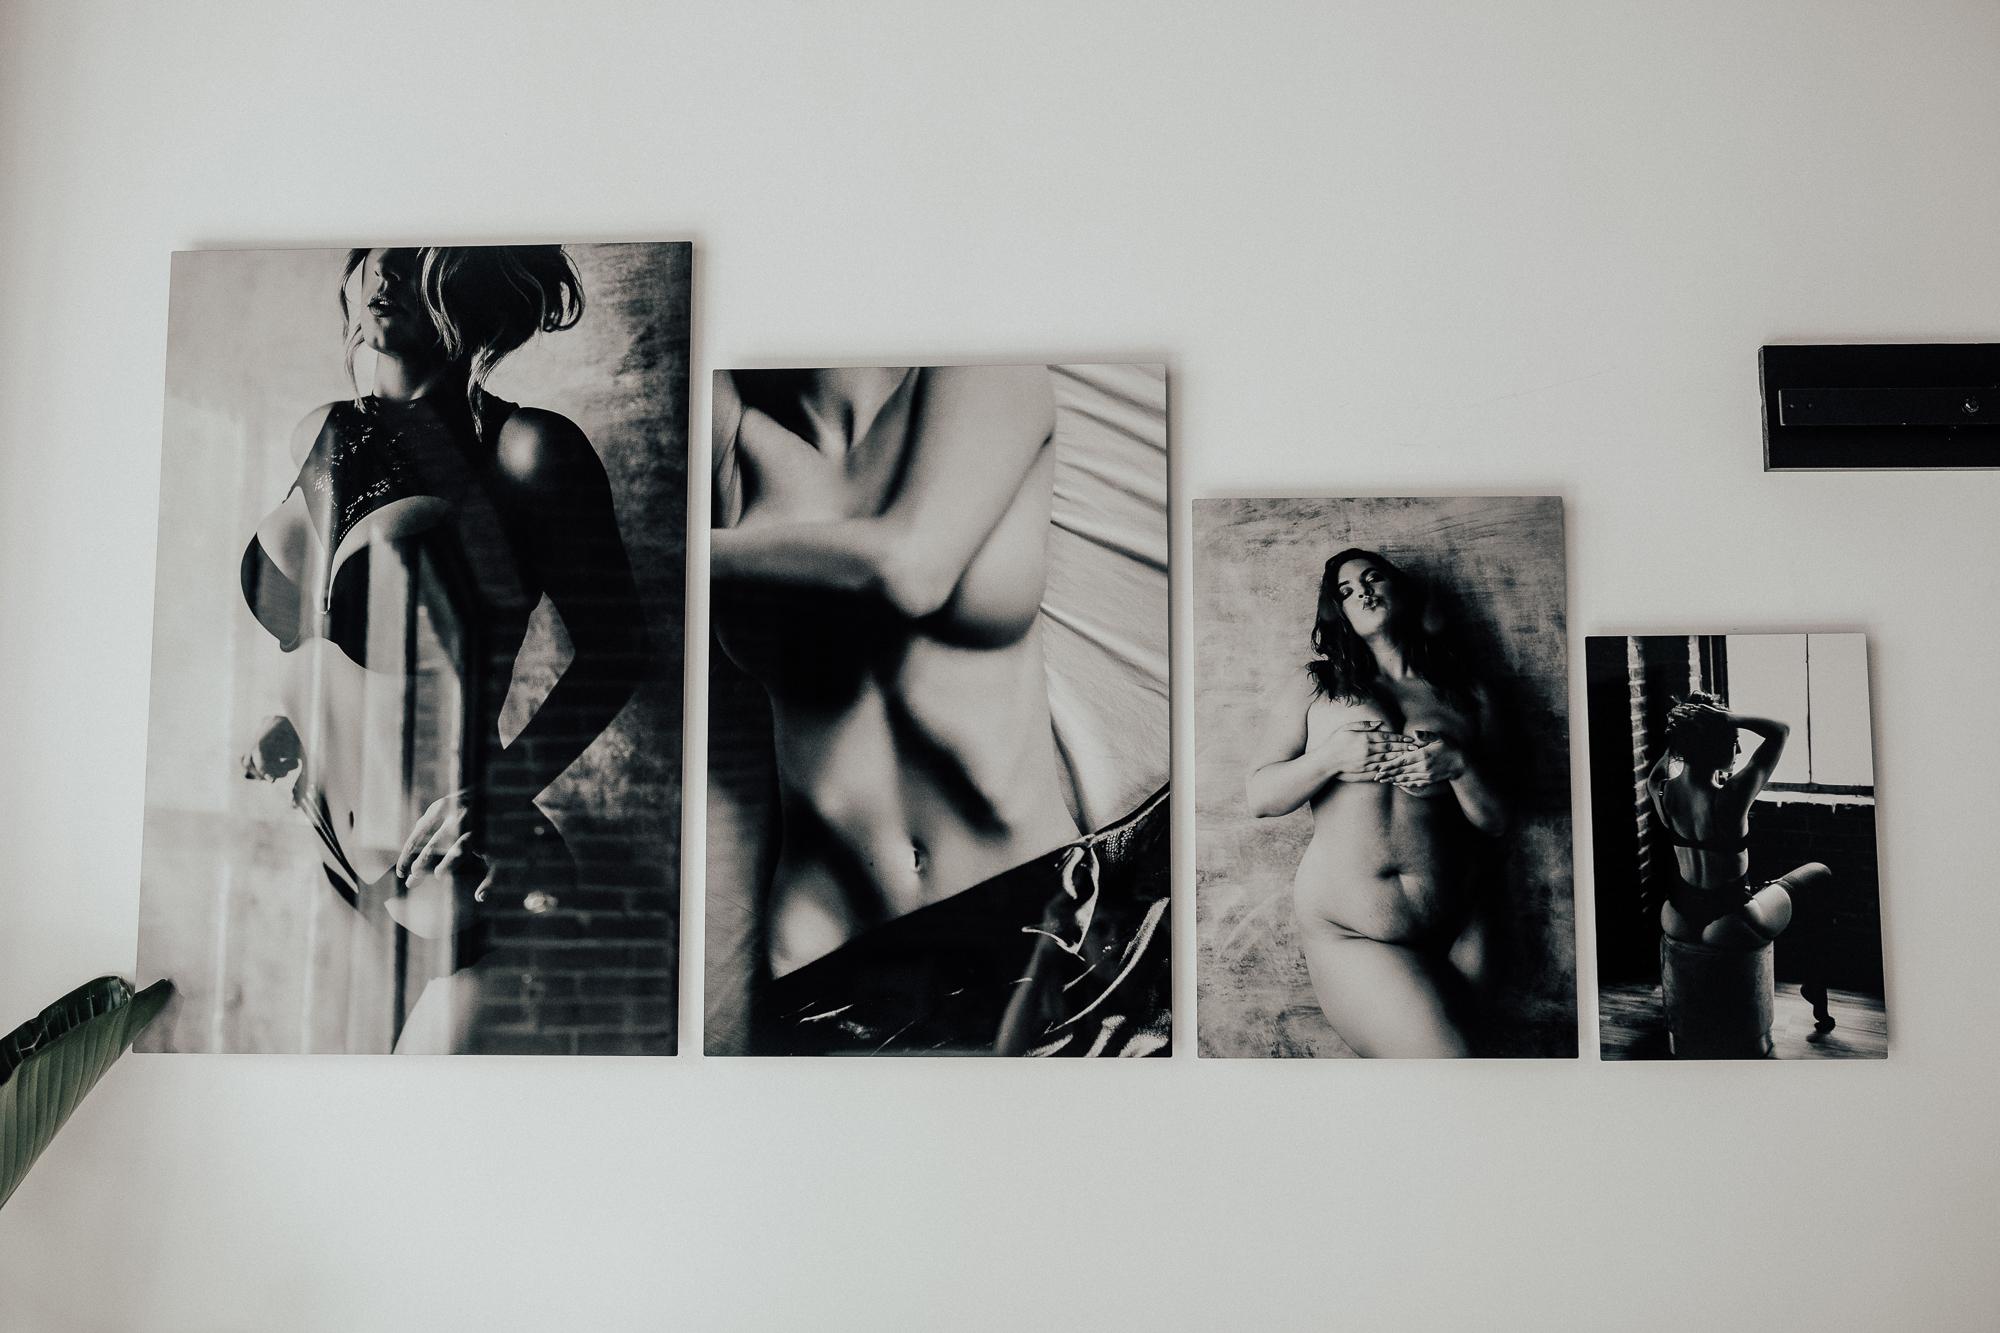 boudoir_studio_kansas_city_indium016.jpg